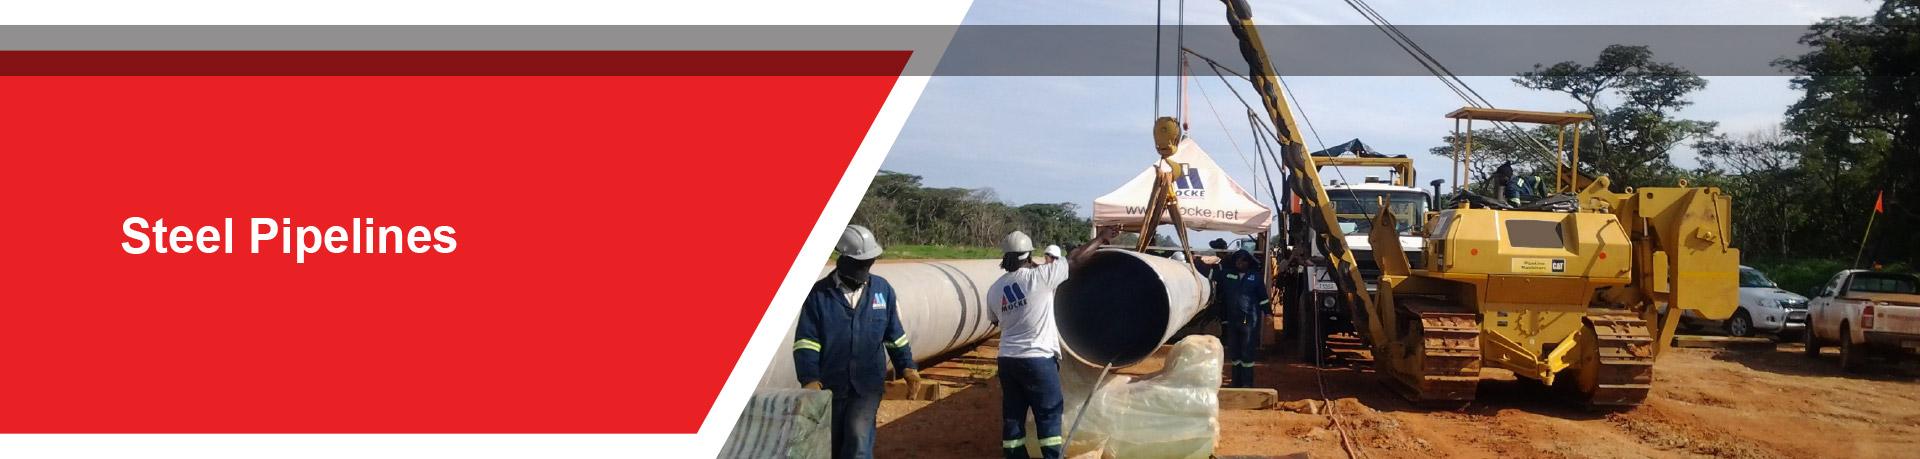 mocke-pipeline-construction-solutions-headers-steel-pipelines